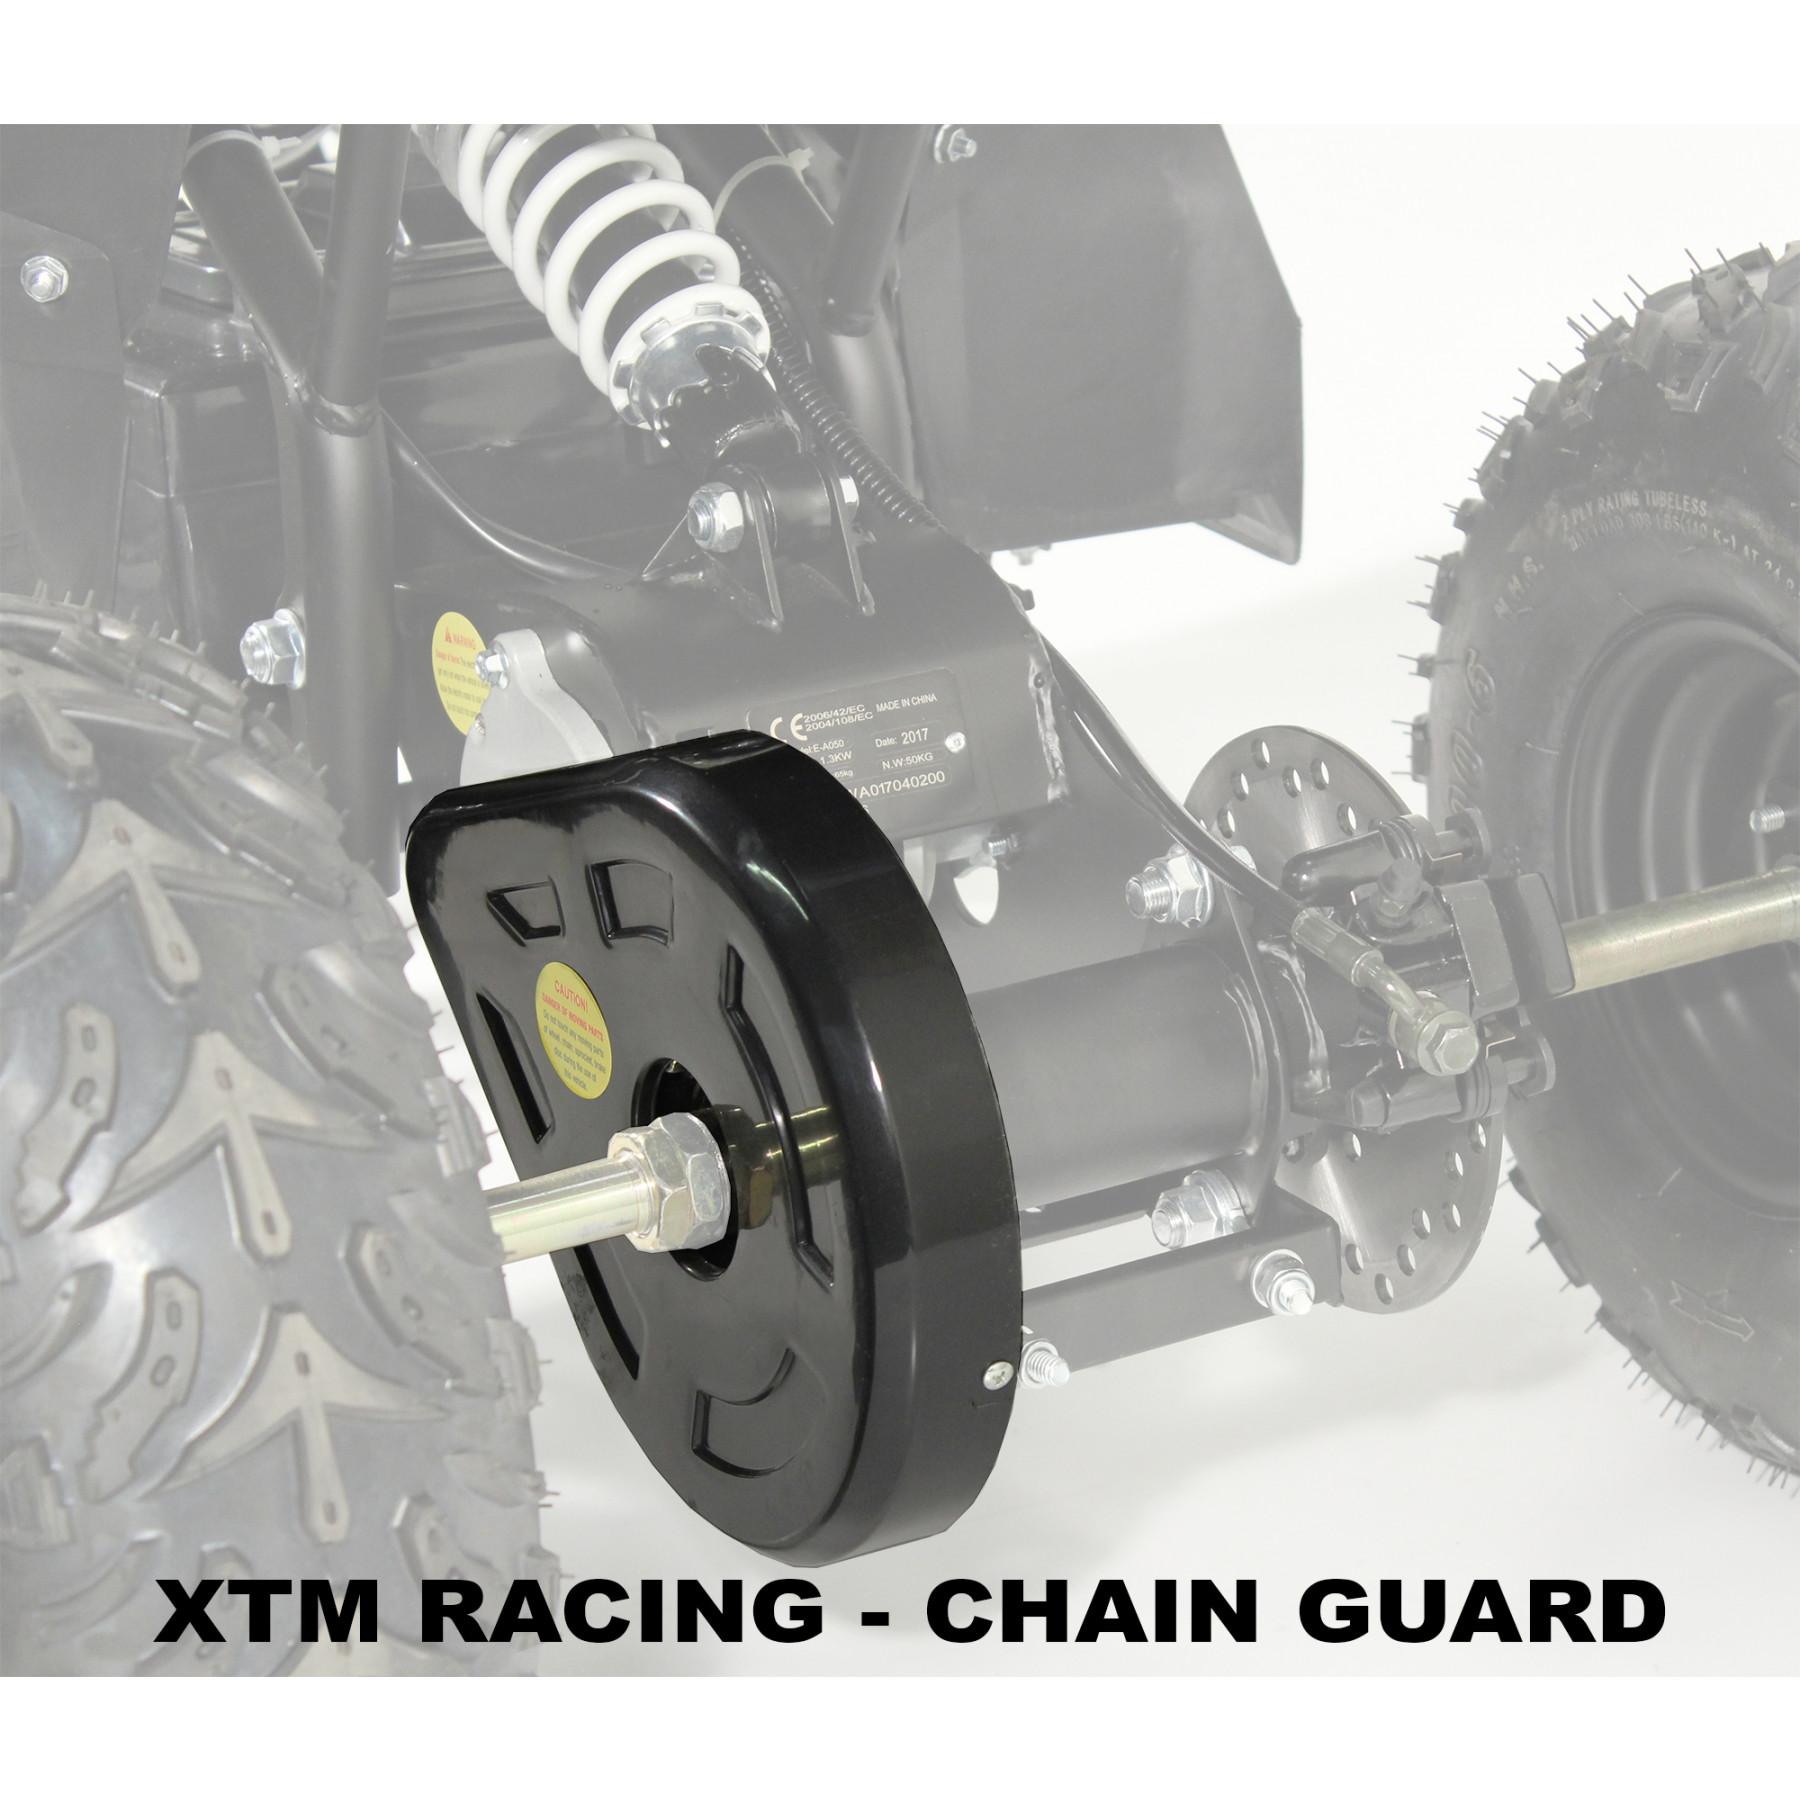 XTM RACING QUAD COMPLETE CHAIN GUARD